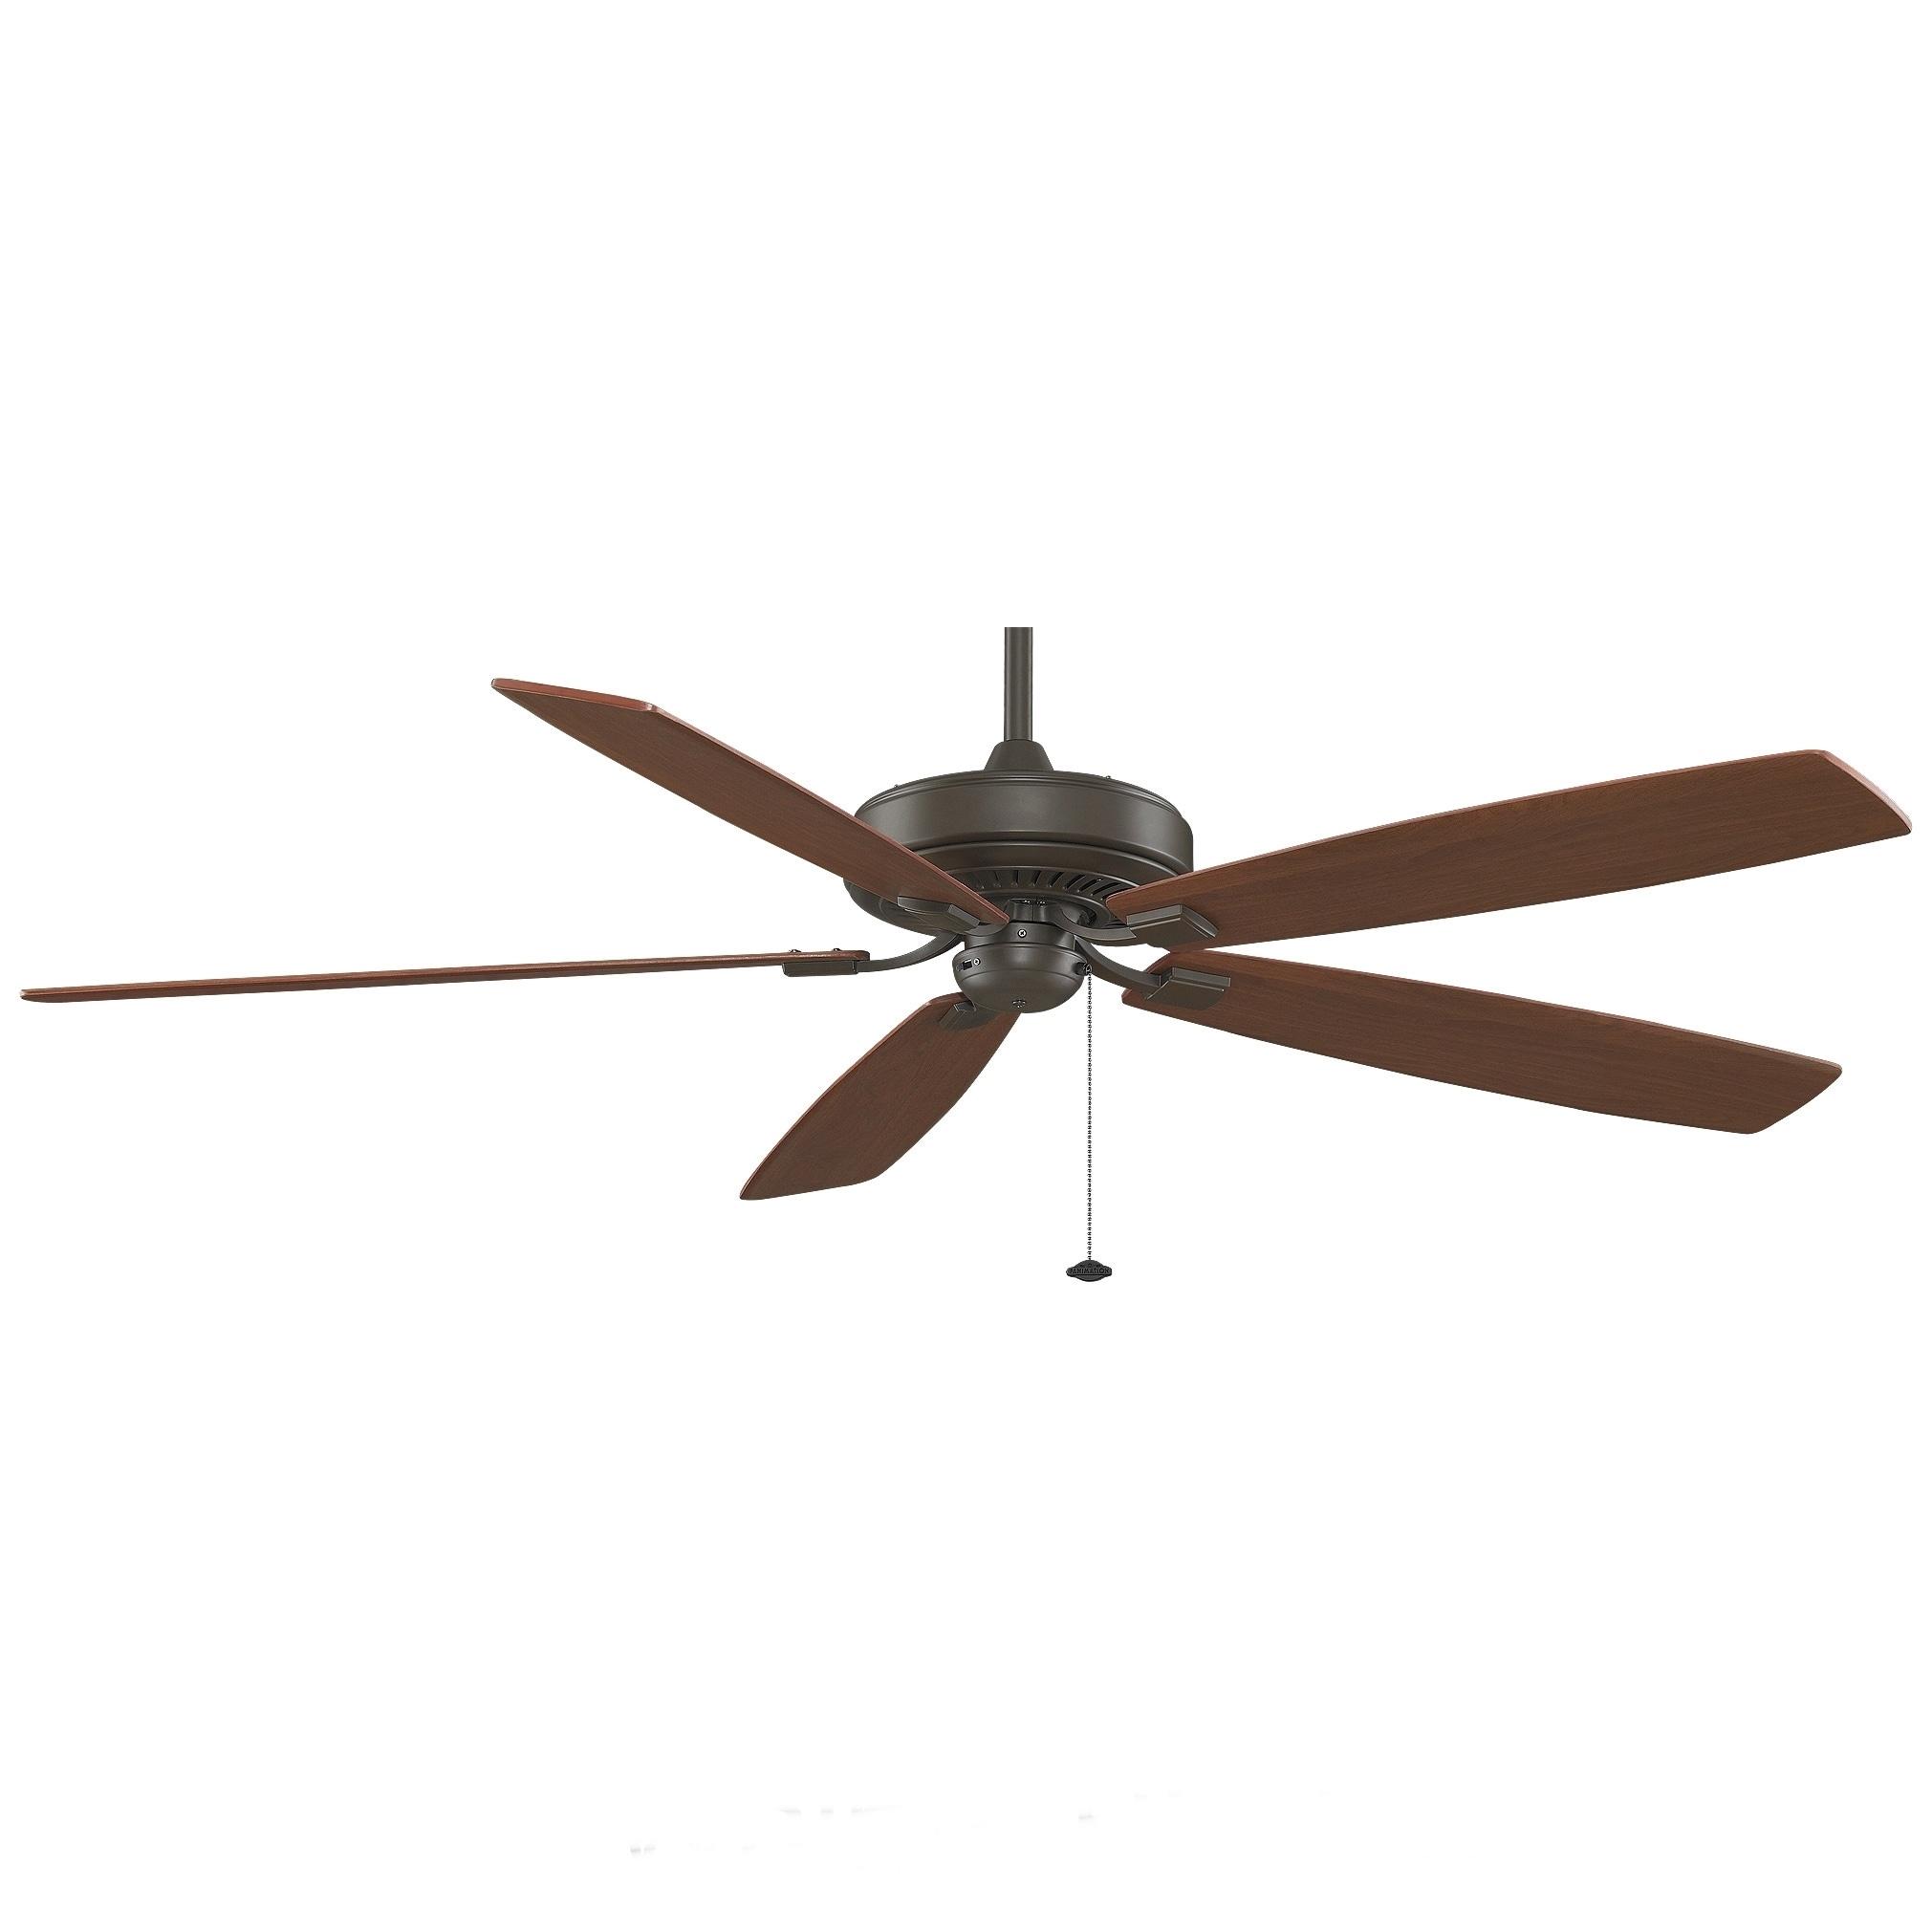 Fanimation Edgewood Supreme 72 inch Oil Rubbed Bronze Ceiling Fan